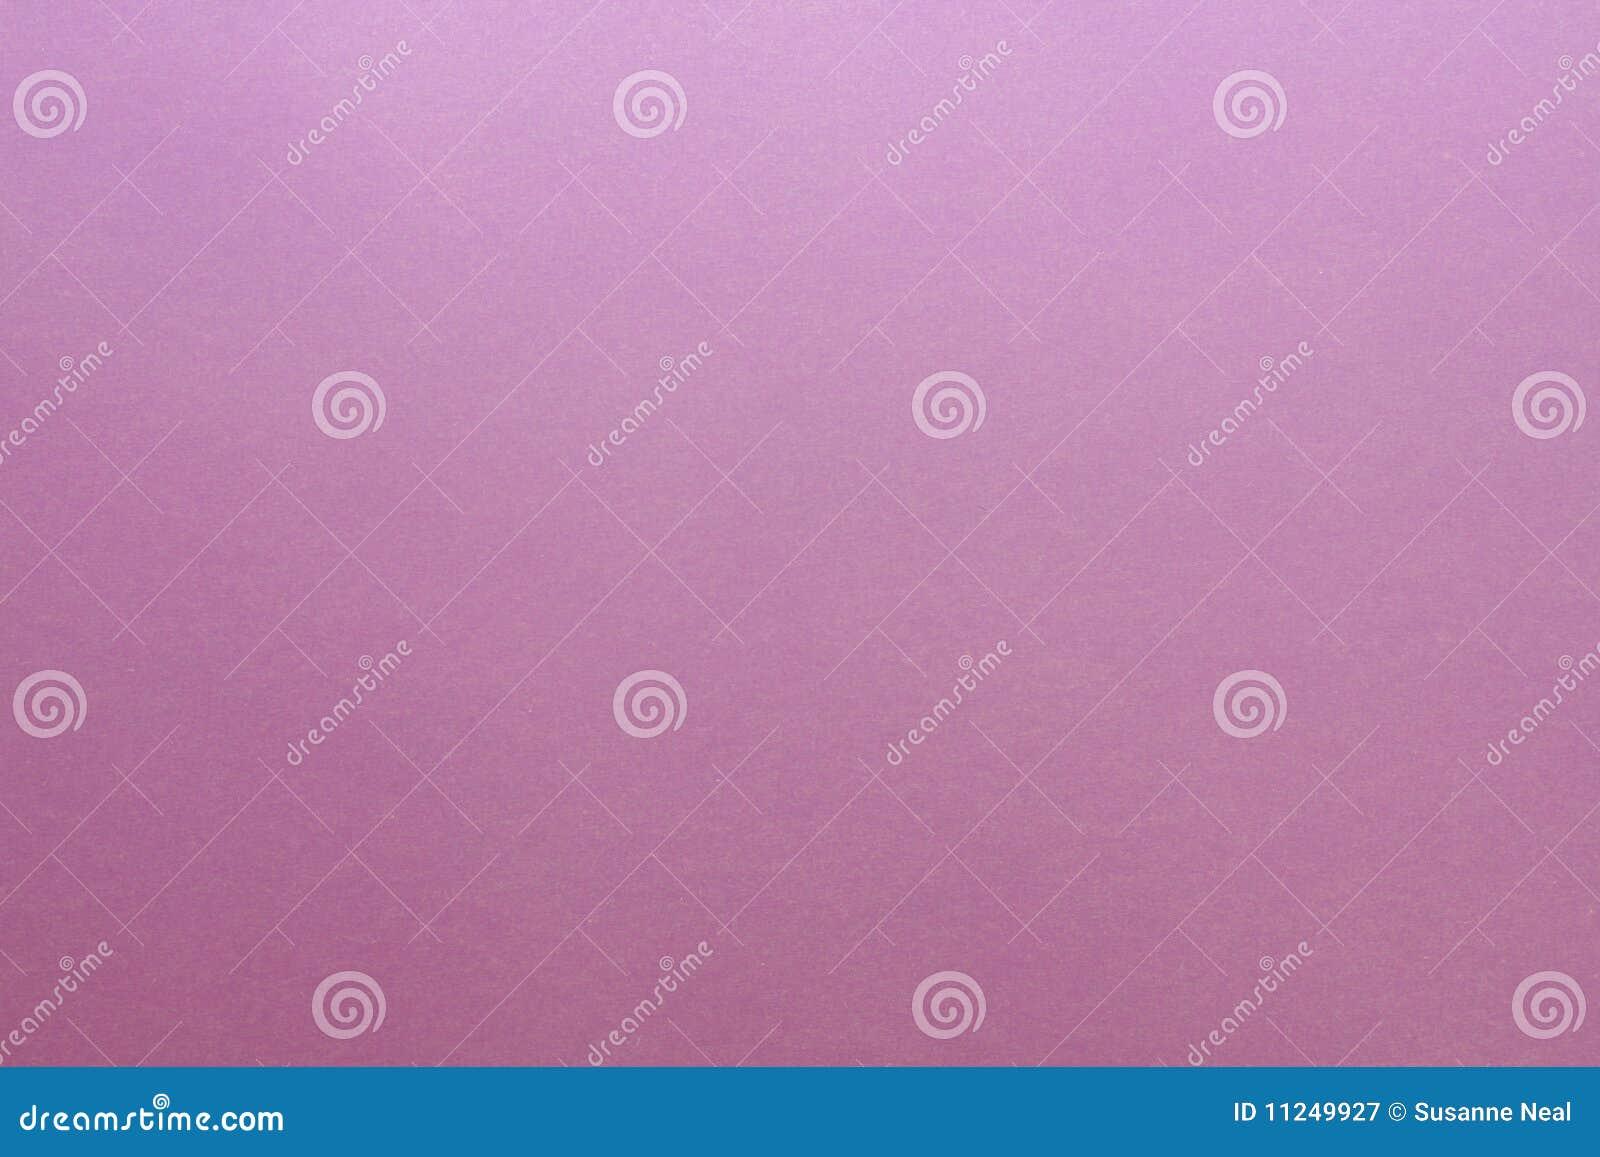 Roze of lavendelachtergrond